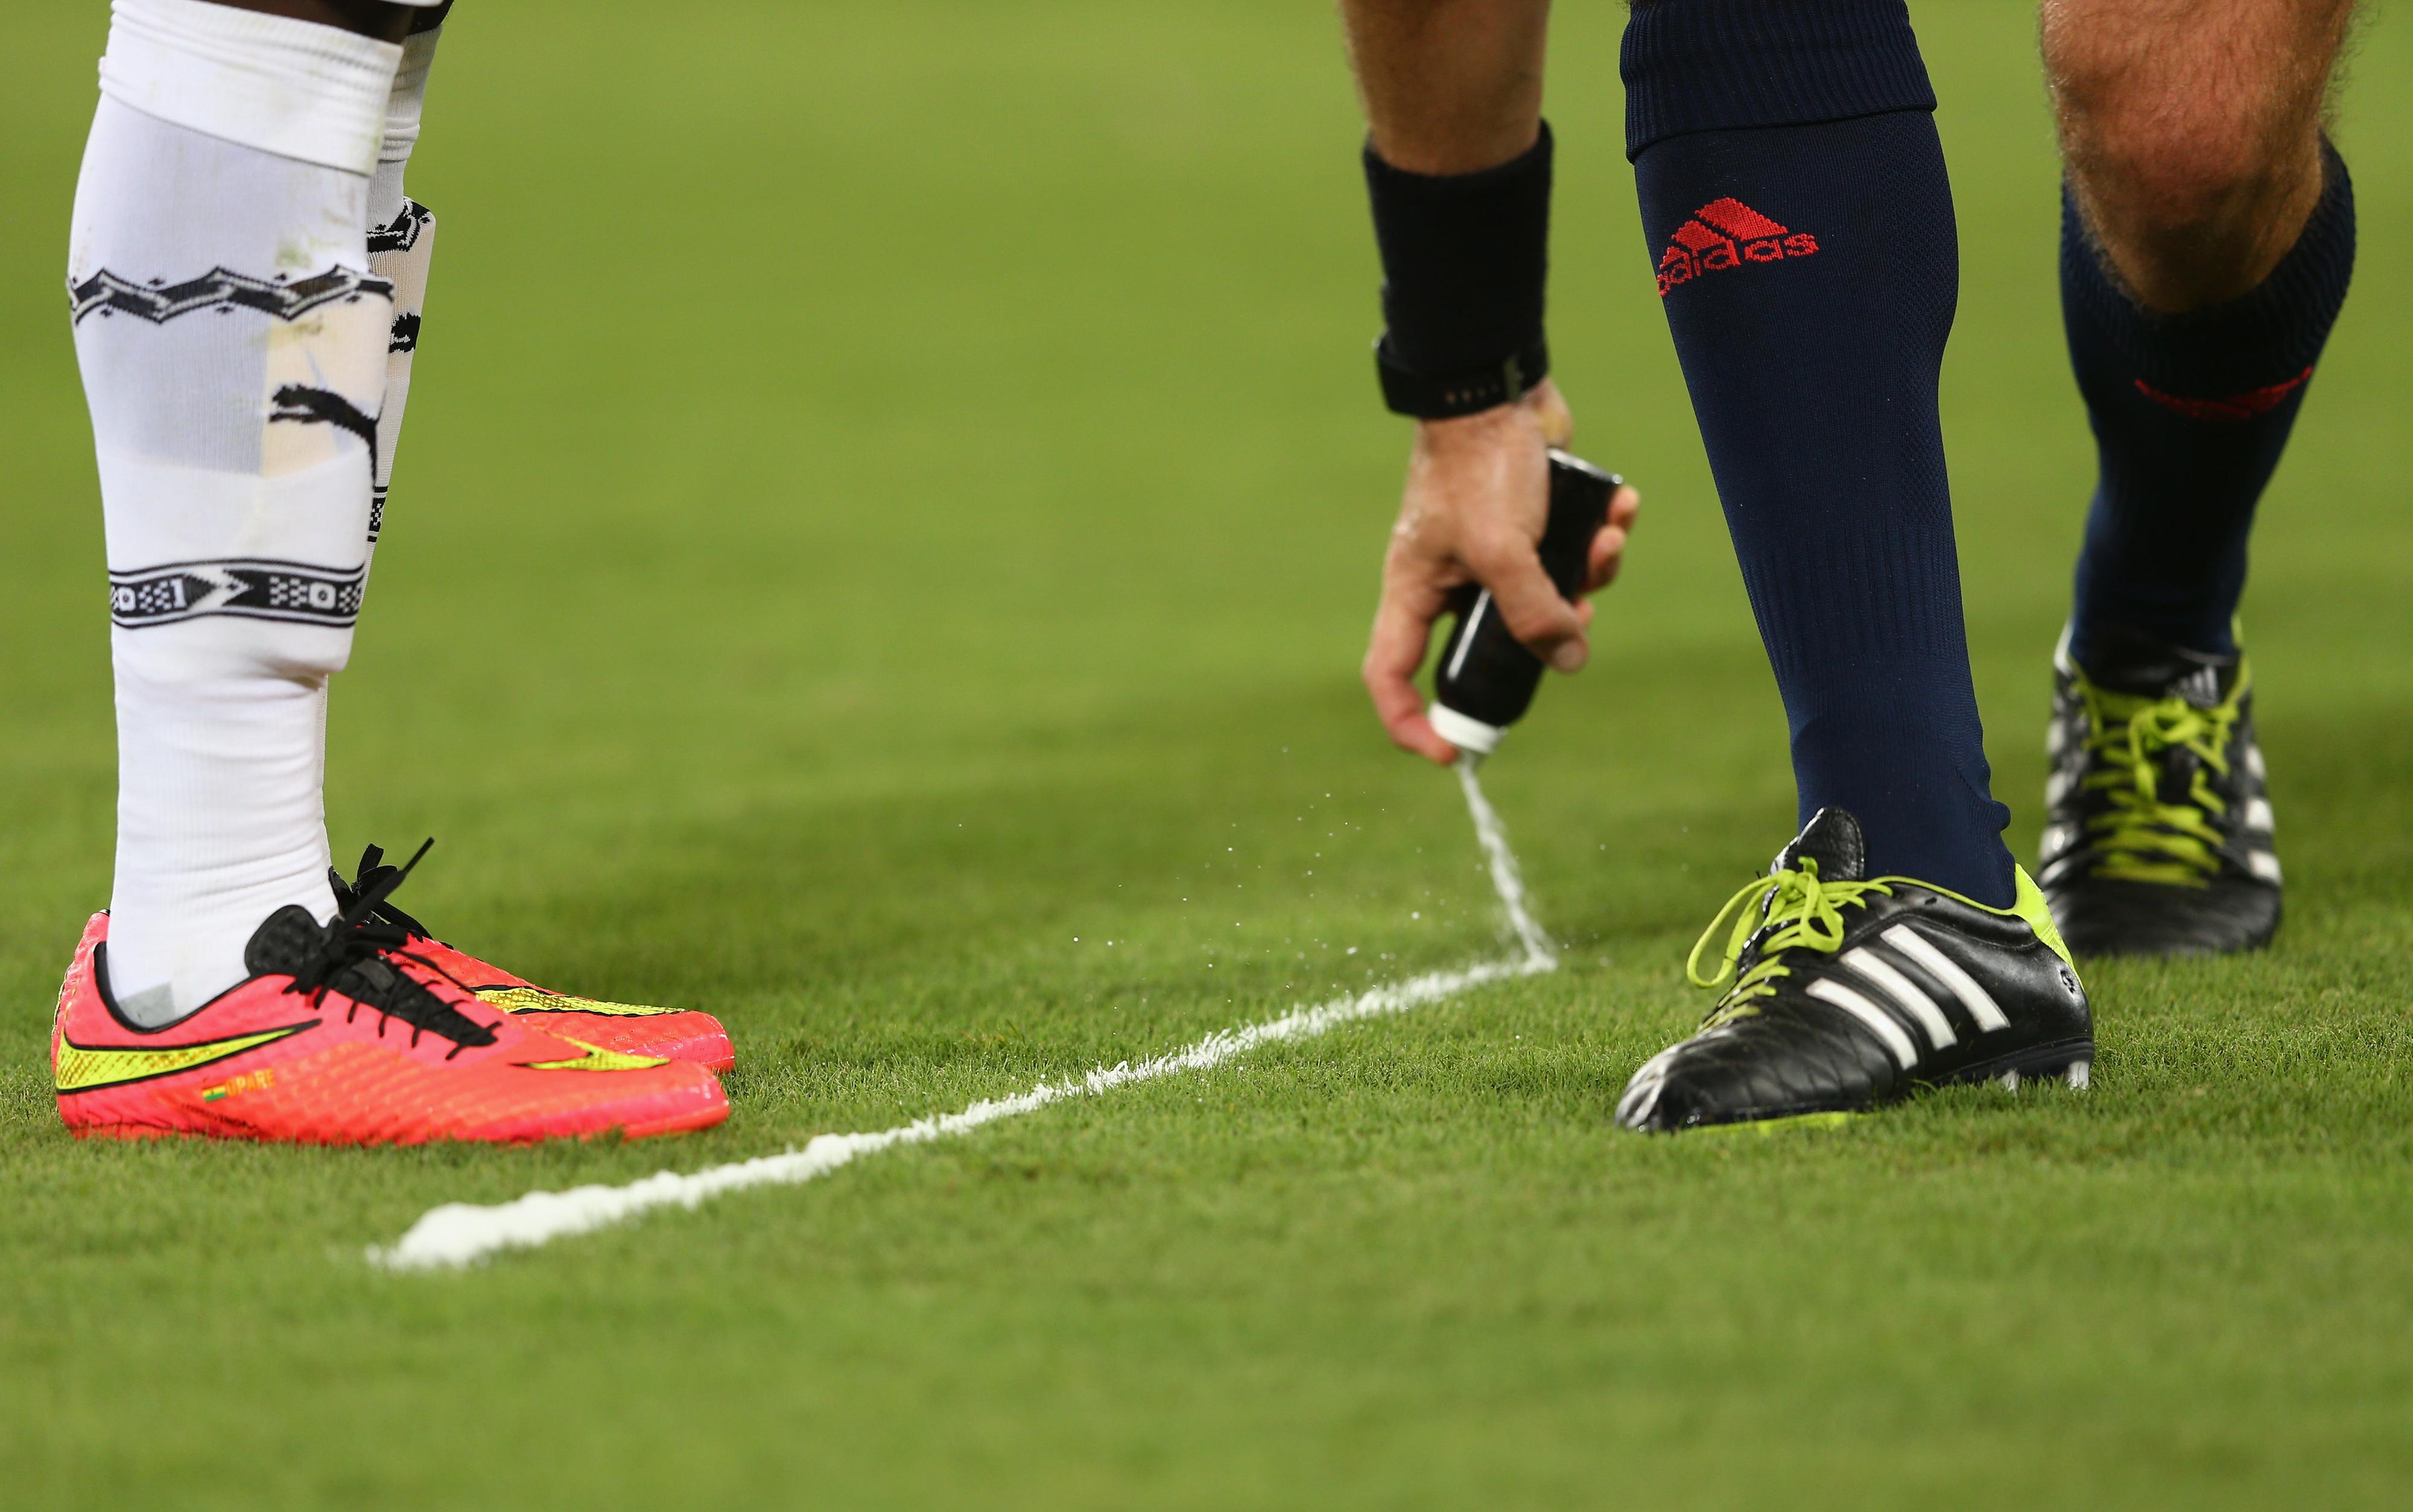 Premier League to use vanishing spray beginning this season